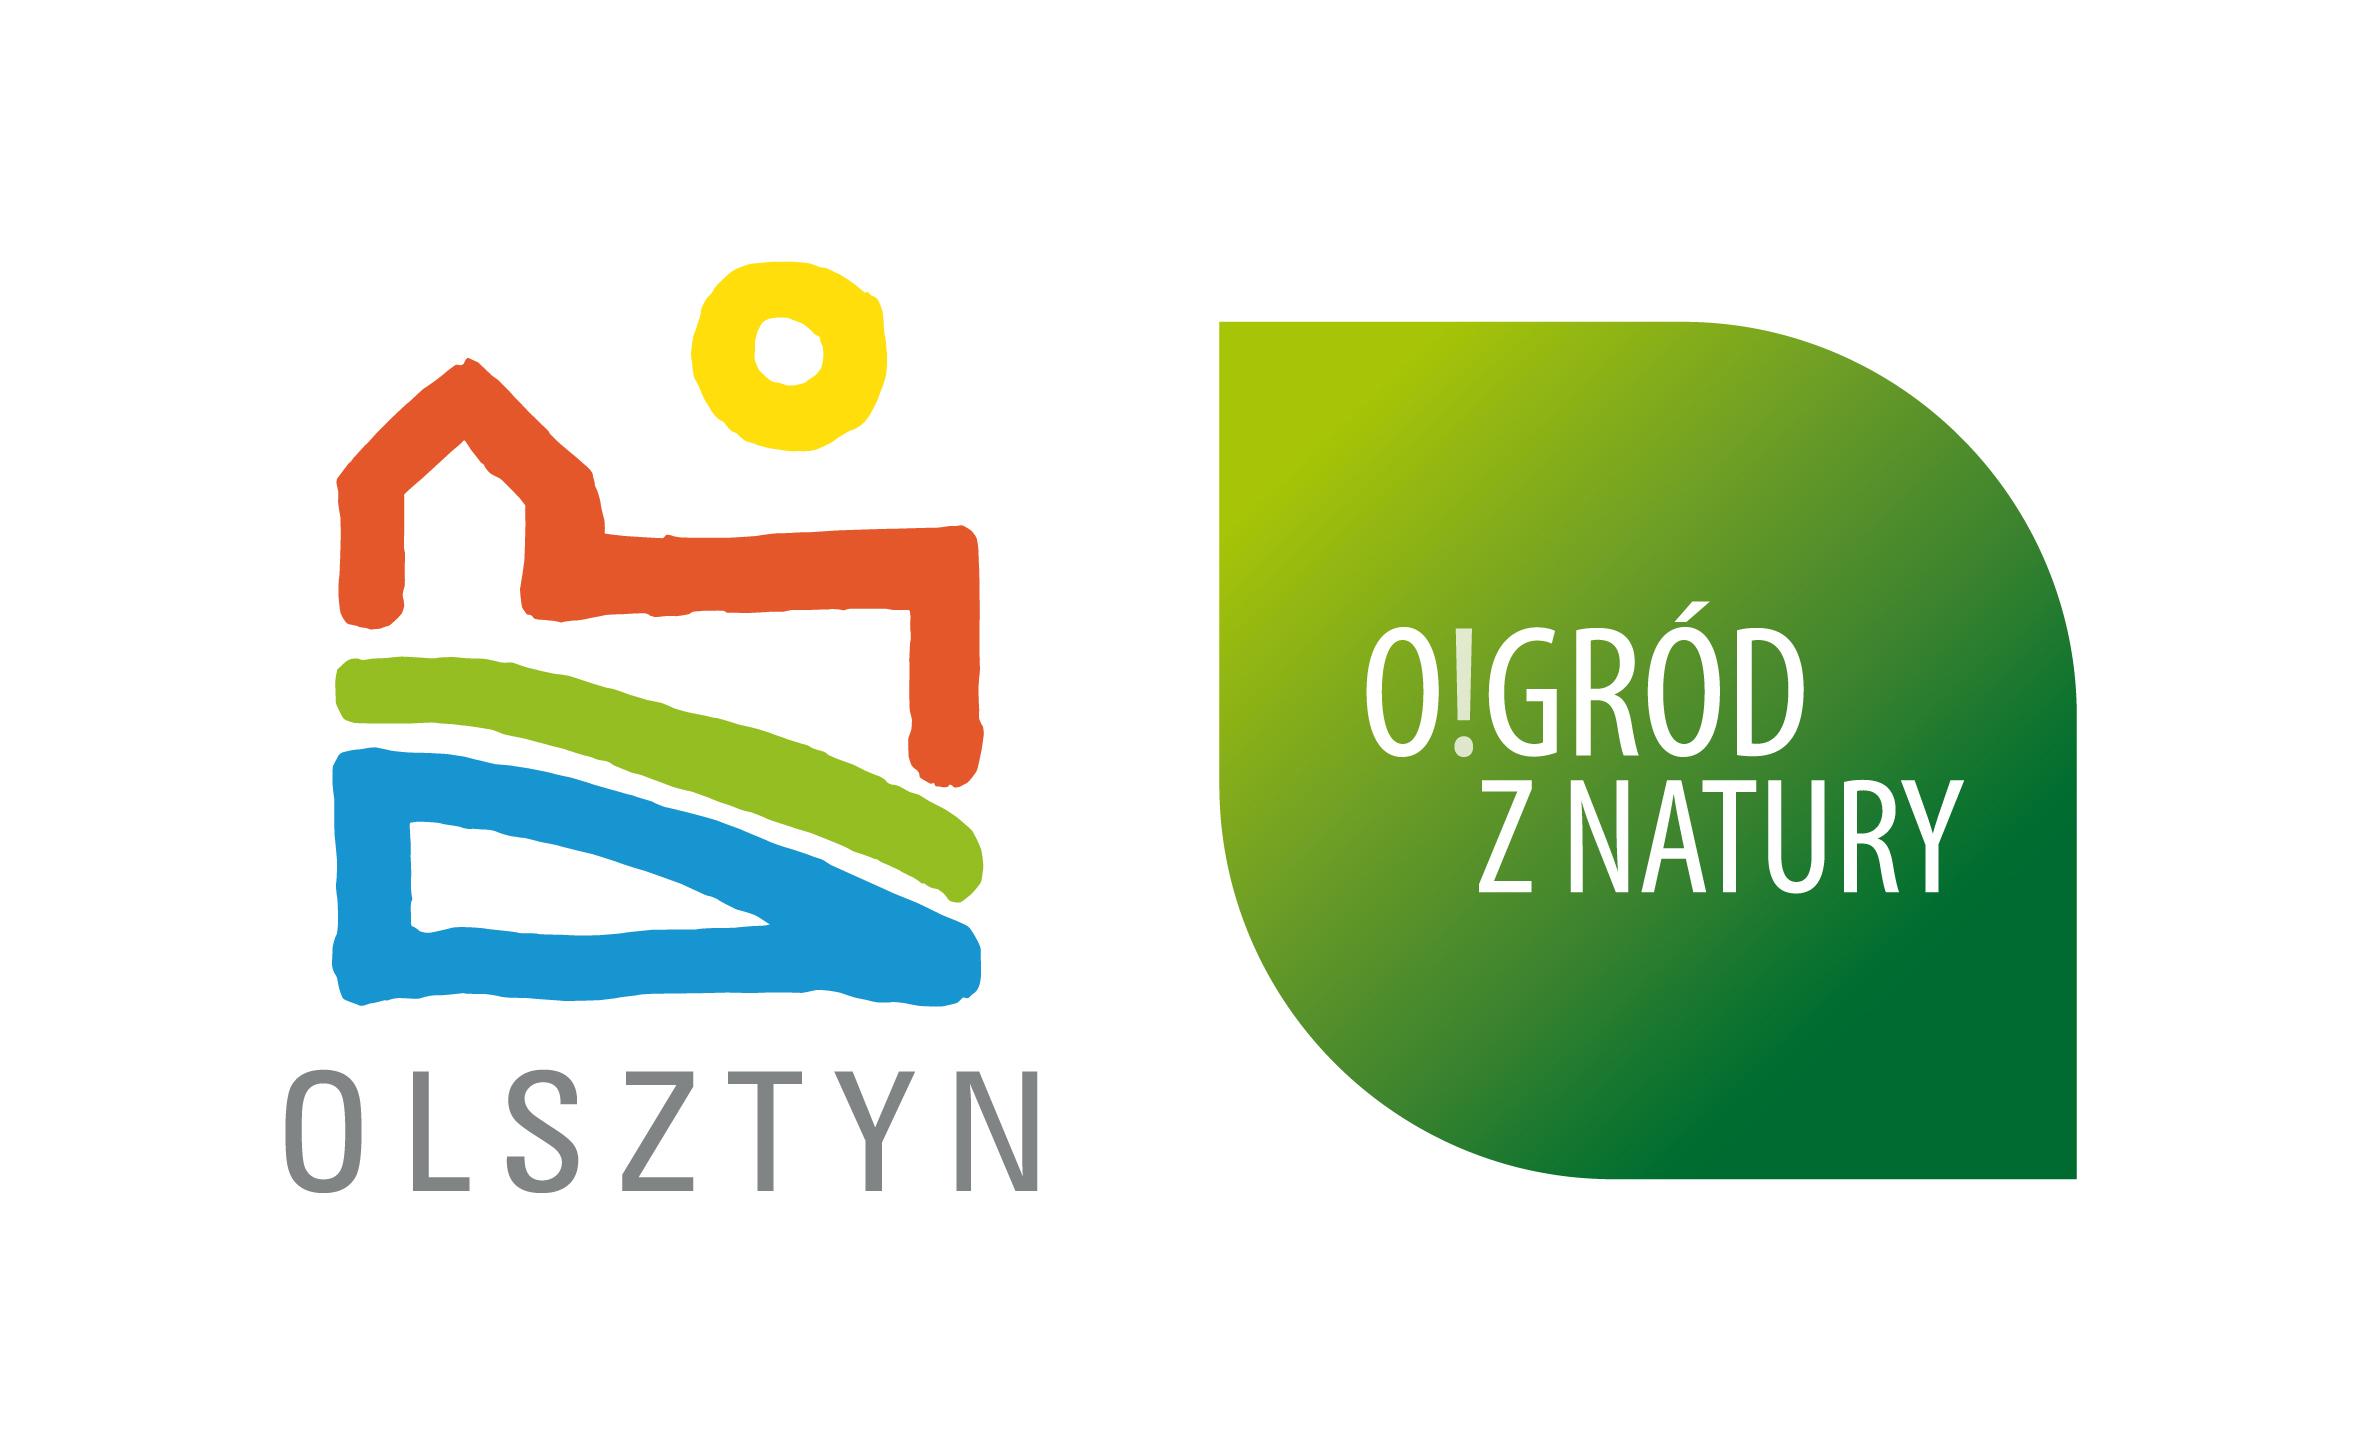 https://m.wmwm.pl/2018/07/orig/logo-z-listkiem-6130.jpg